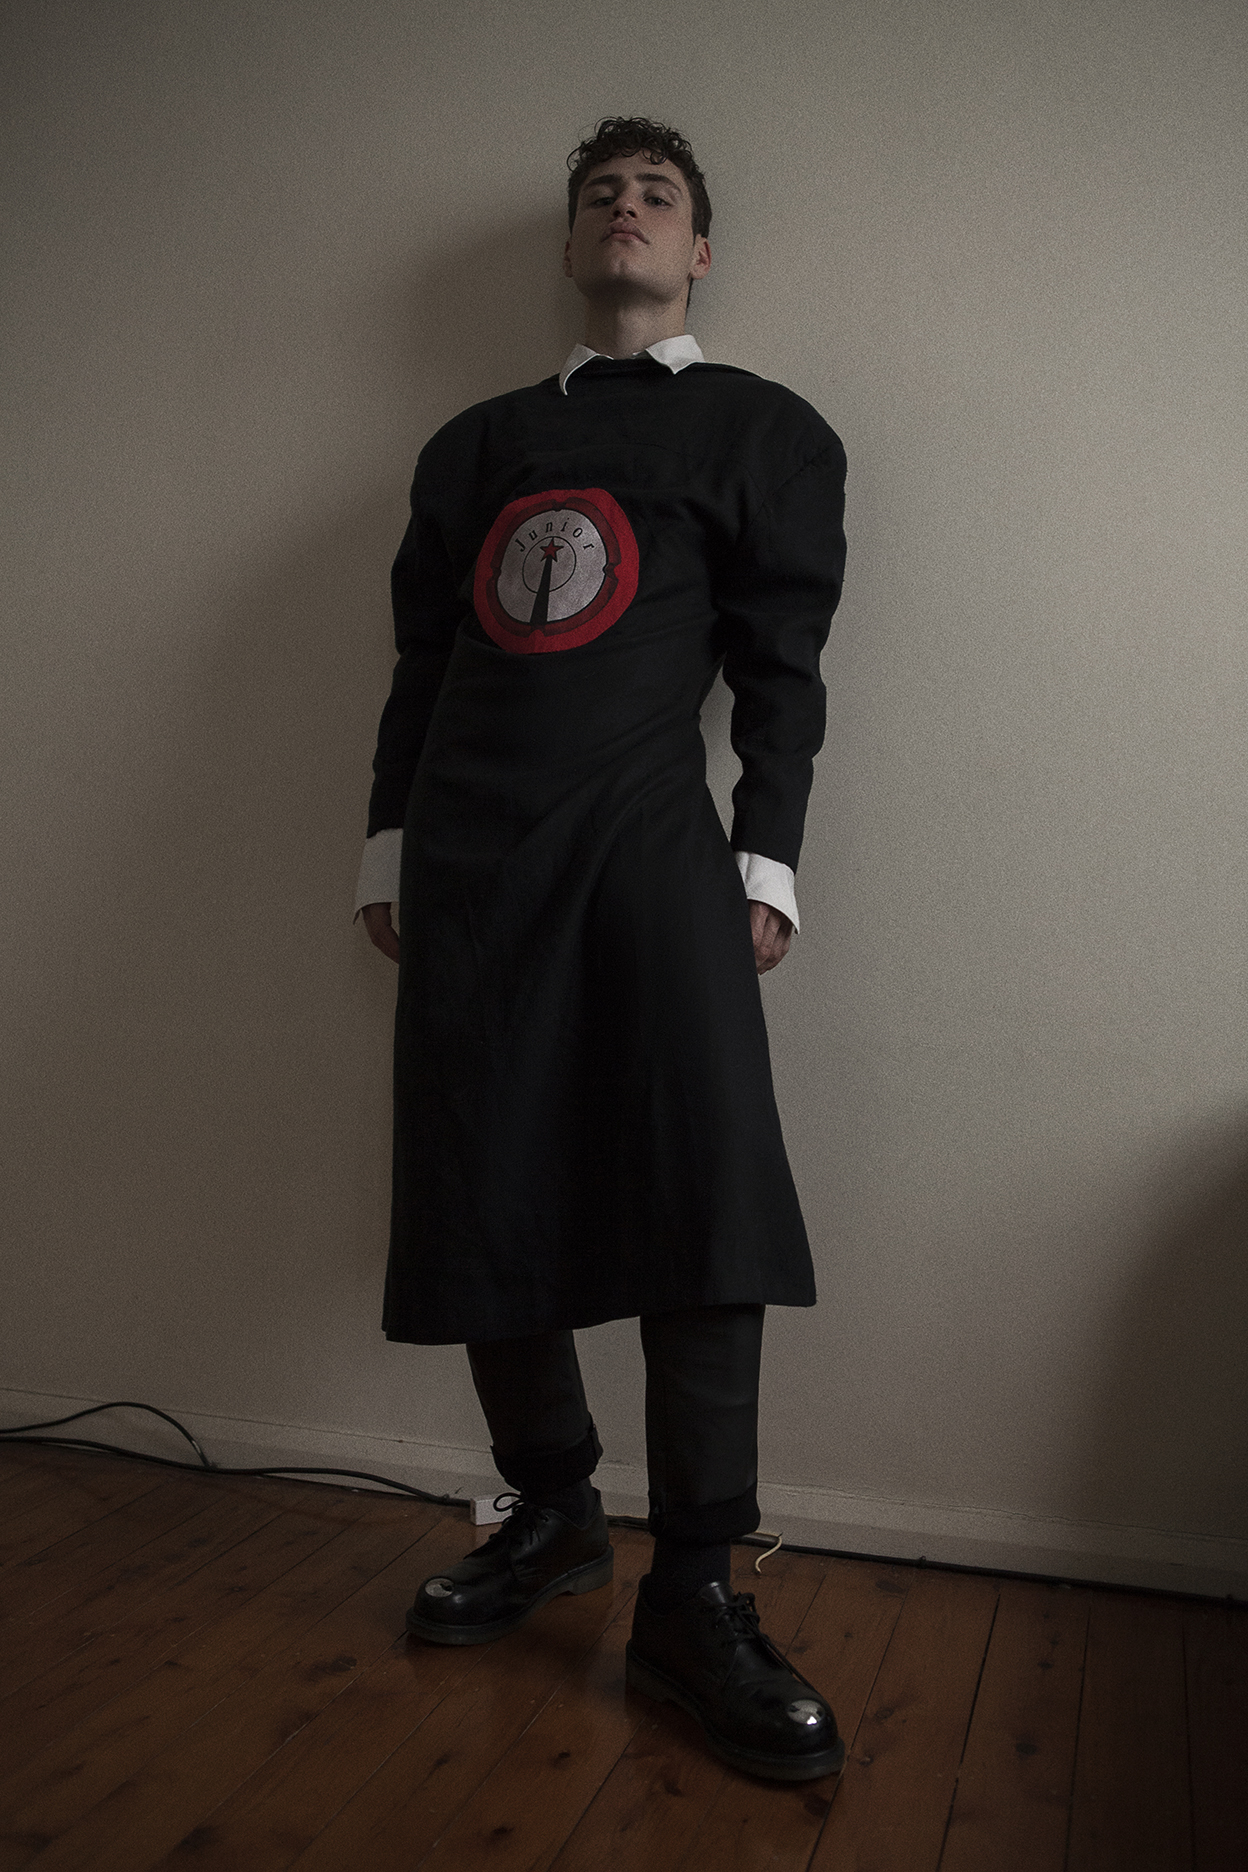 shirt  miu miu  coat  jean paul gaultier  pant  acne studios  shoes  raf simmmons for doc martens